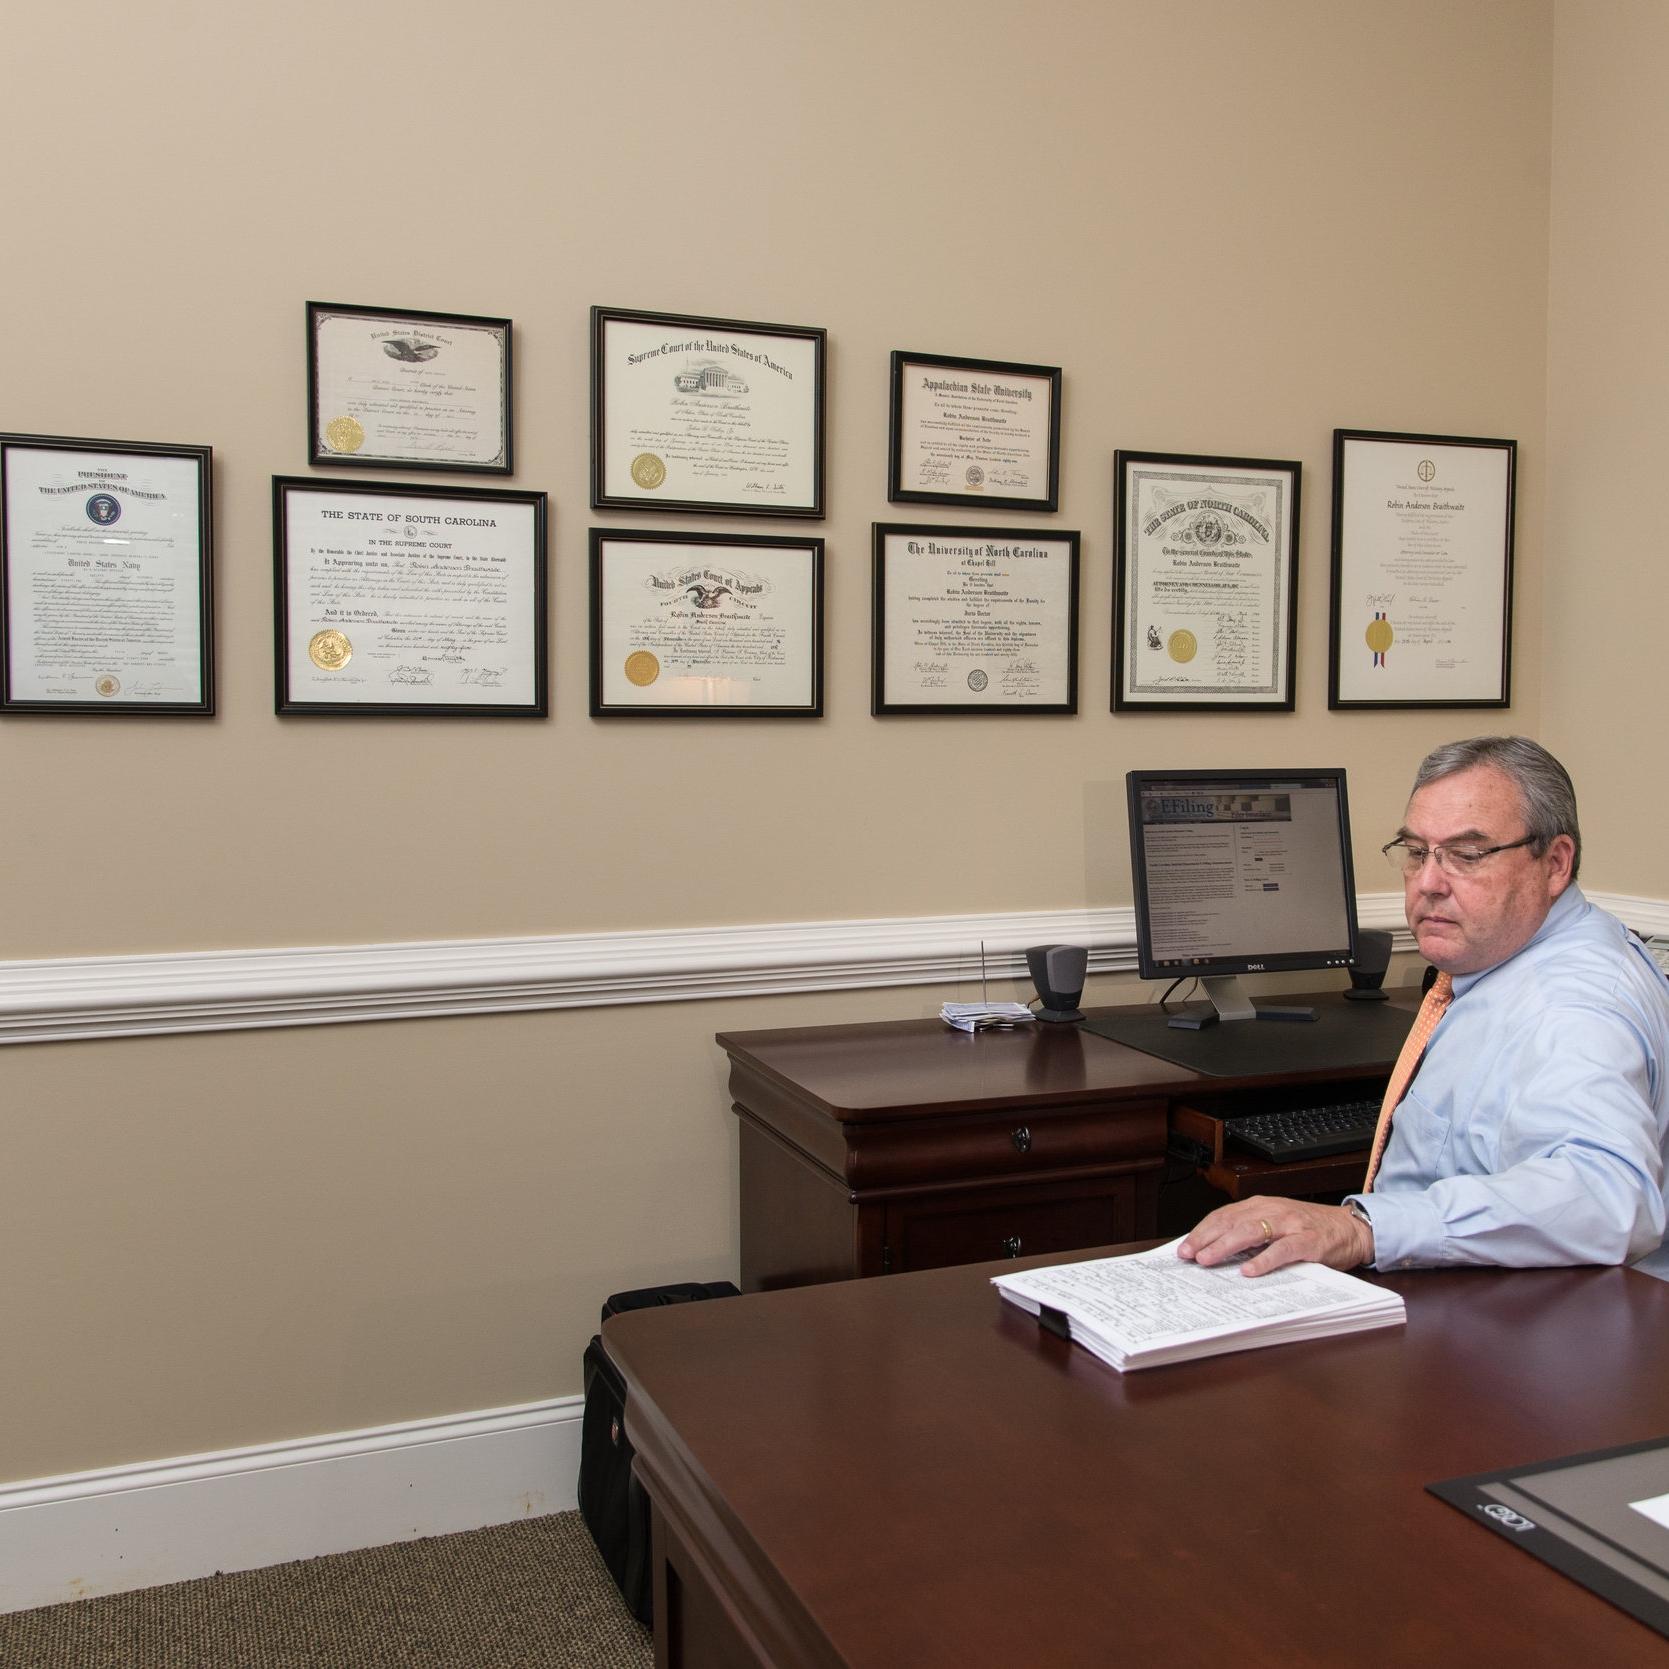 Rob Braithwaite Mediation Mediator Law Firm Civil Litigation Trial Plaintiff Defense